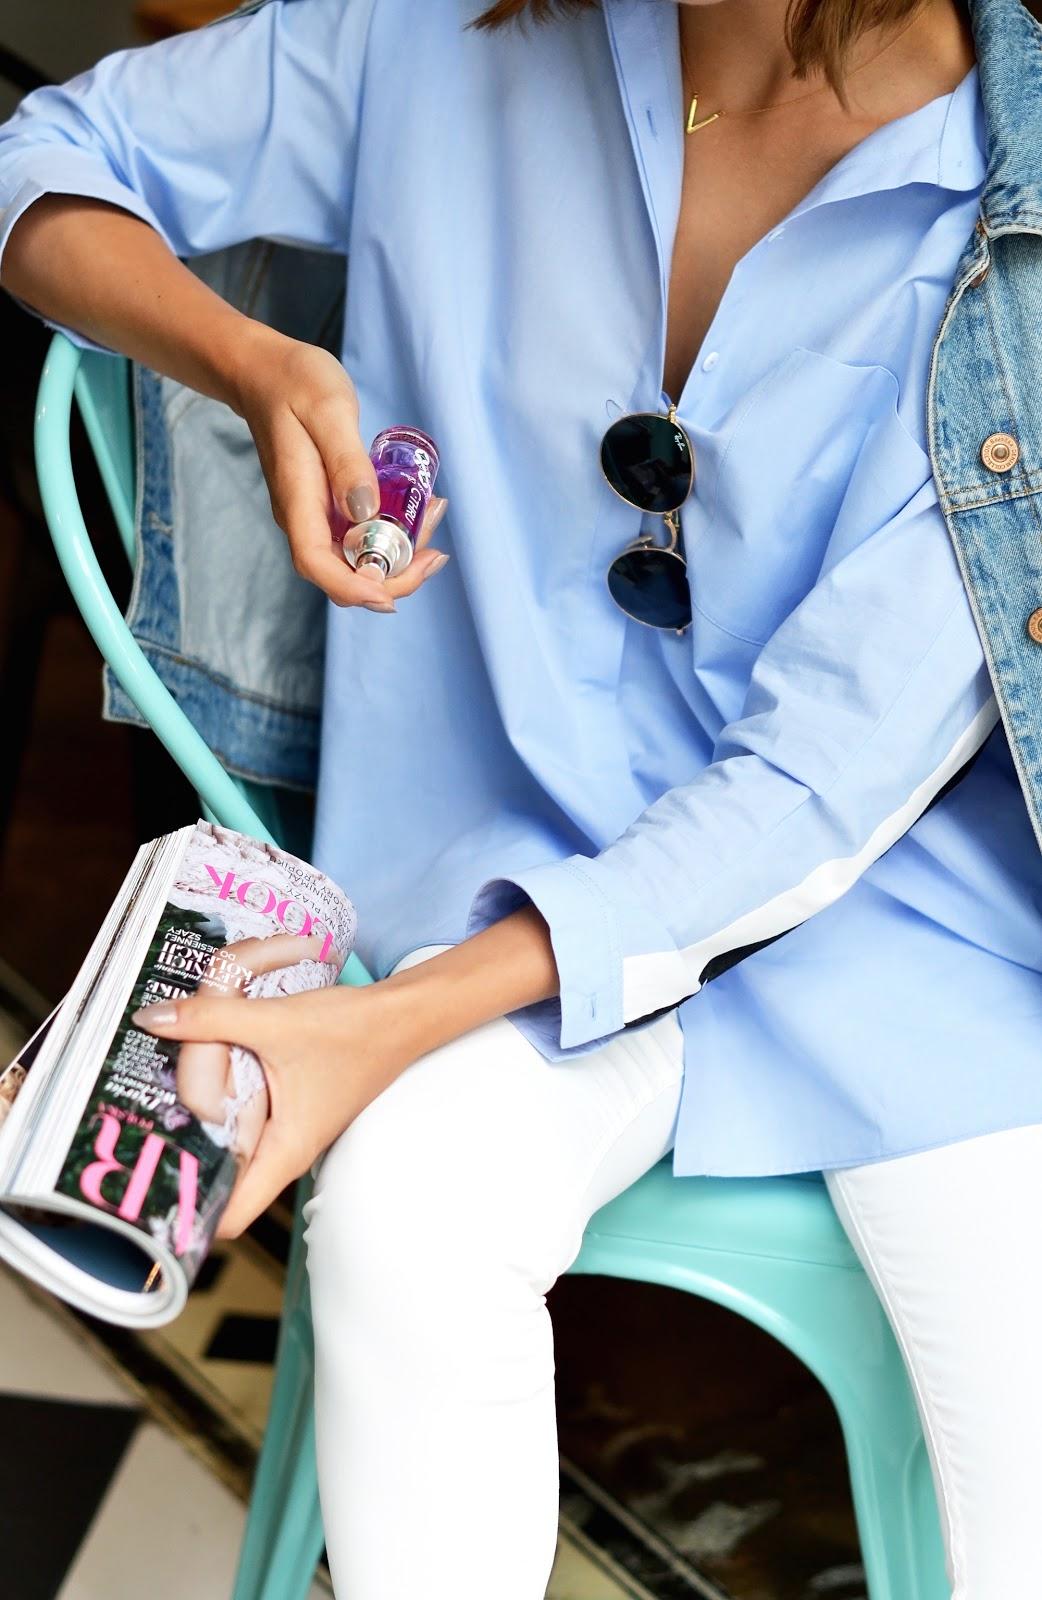 perfumy c-thru | blogerka z krakowa | bonjour cava krakow